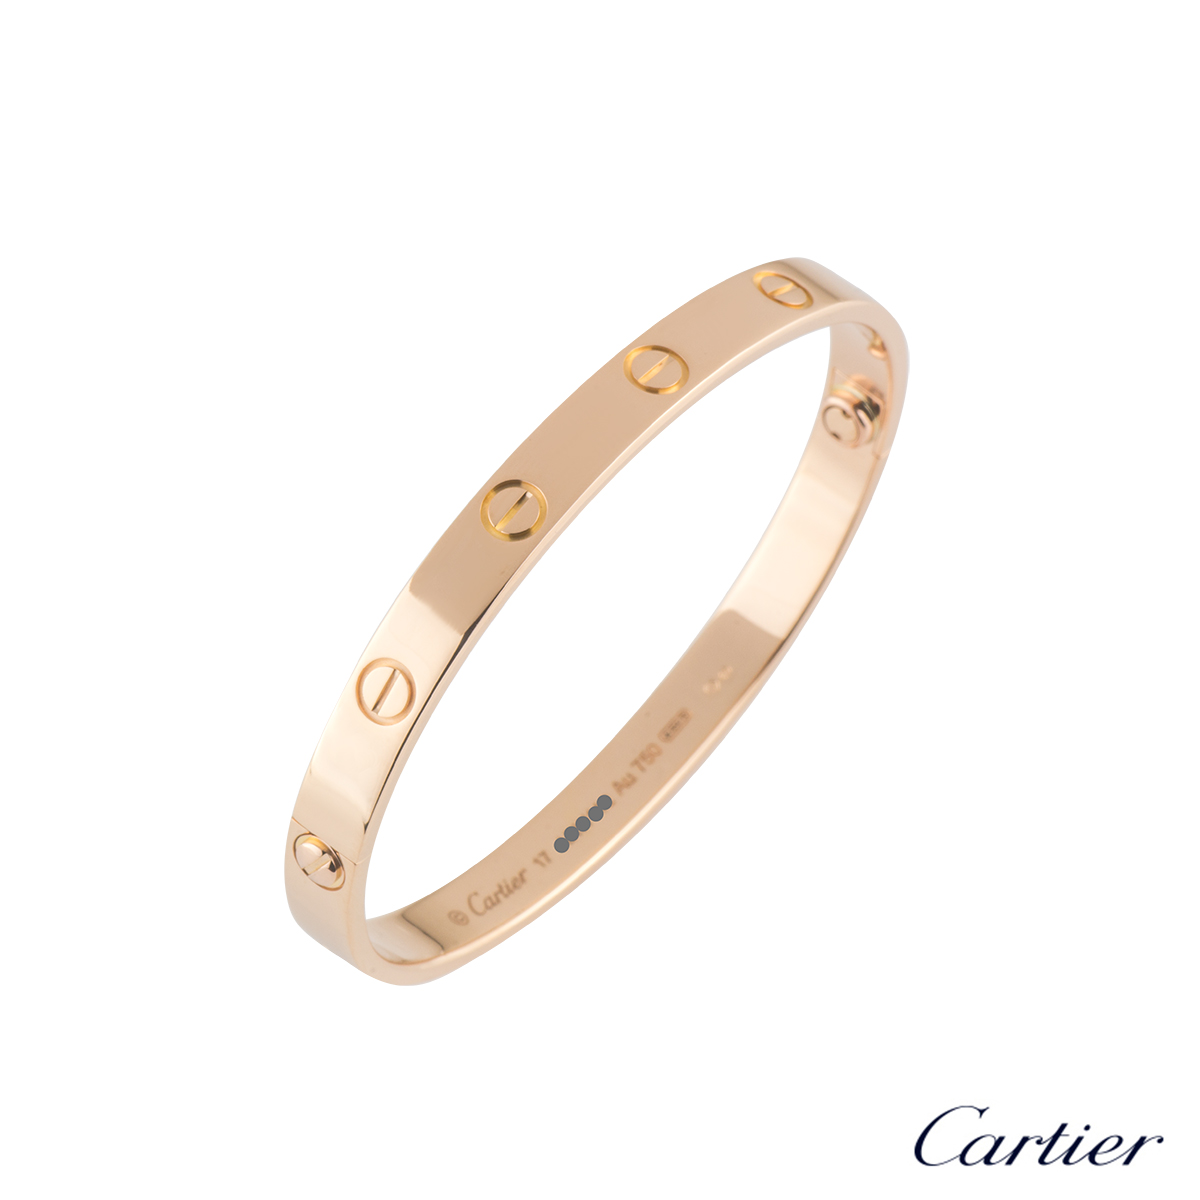 CartierRose Gold Plain Love Bracelet Size 17B6035617